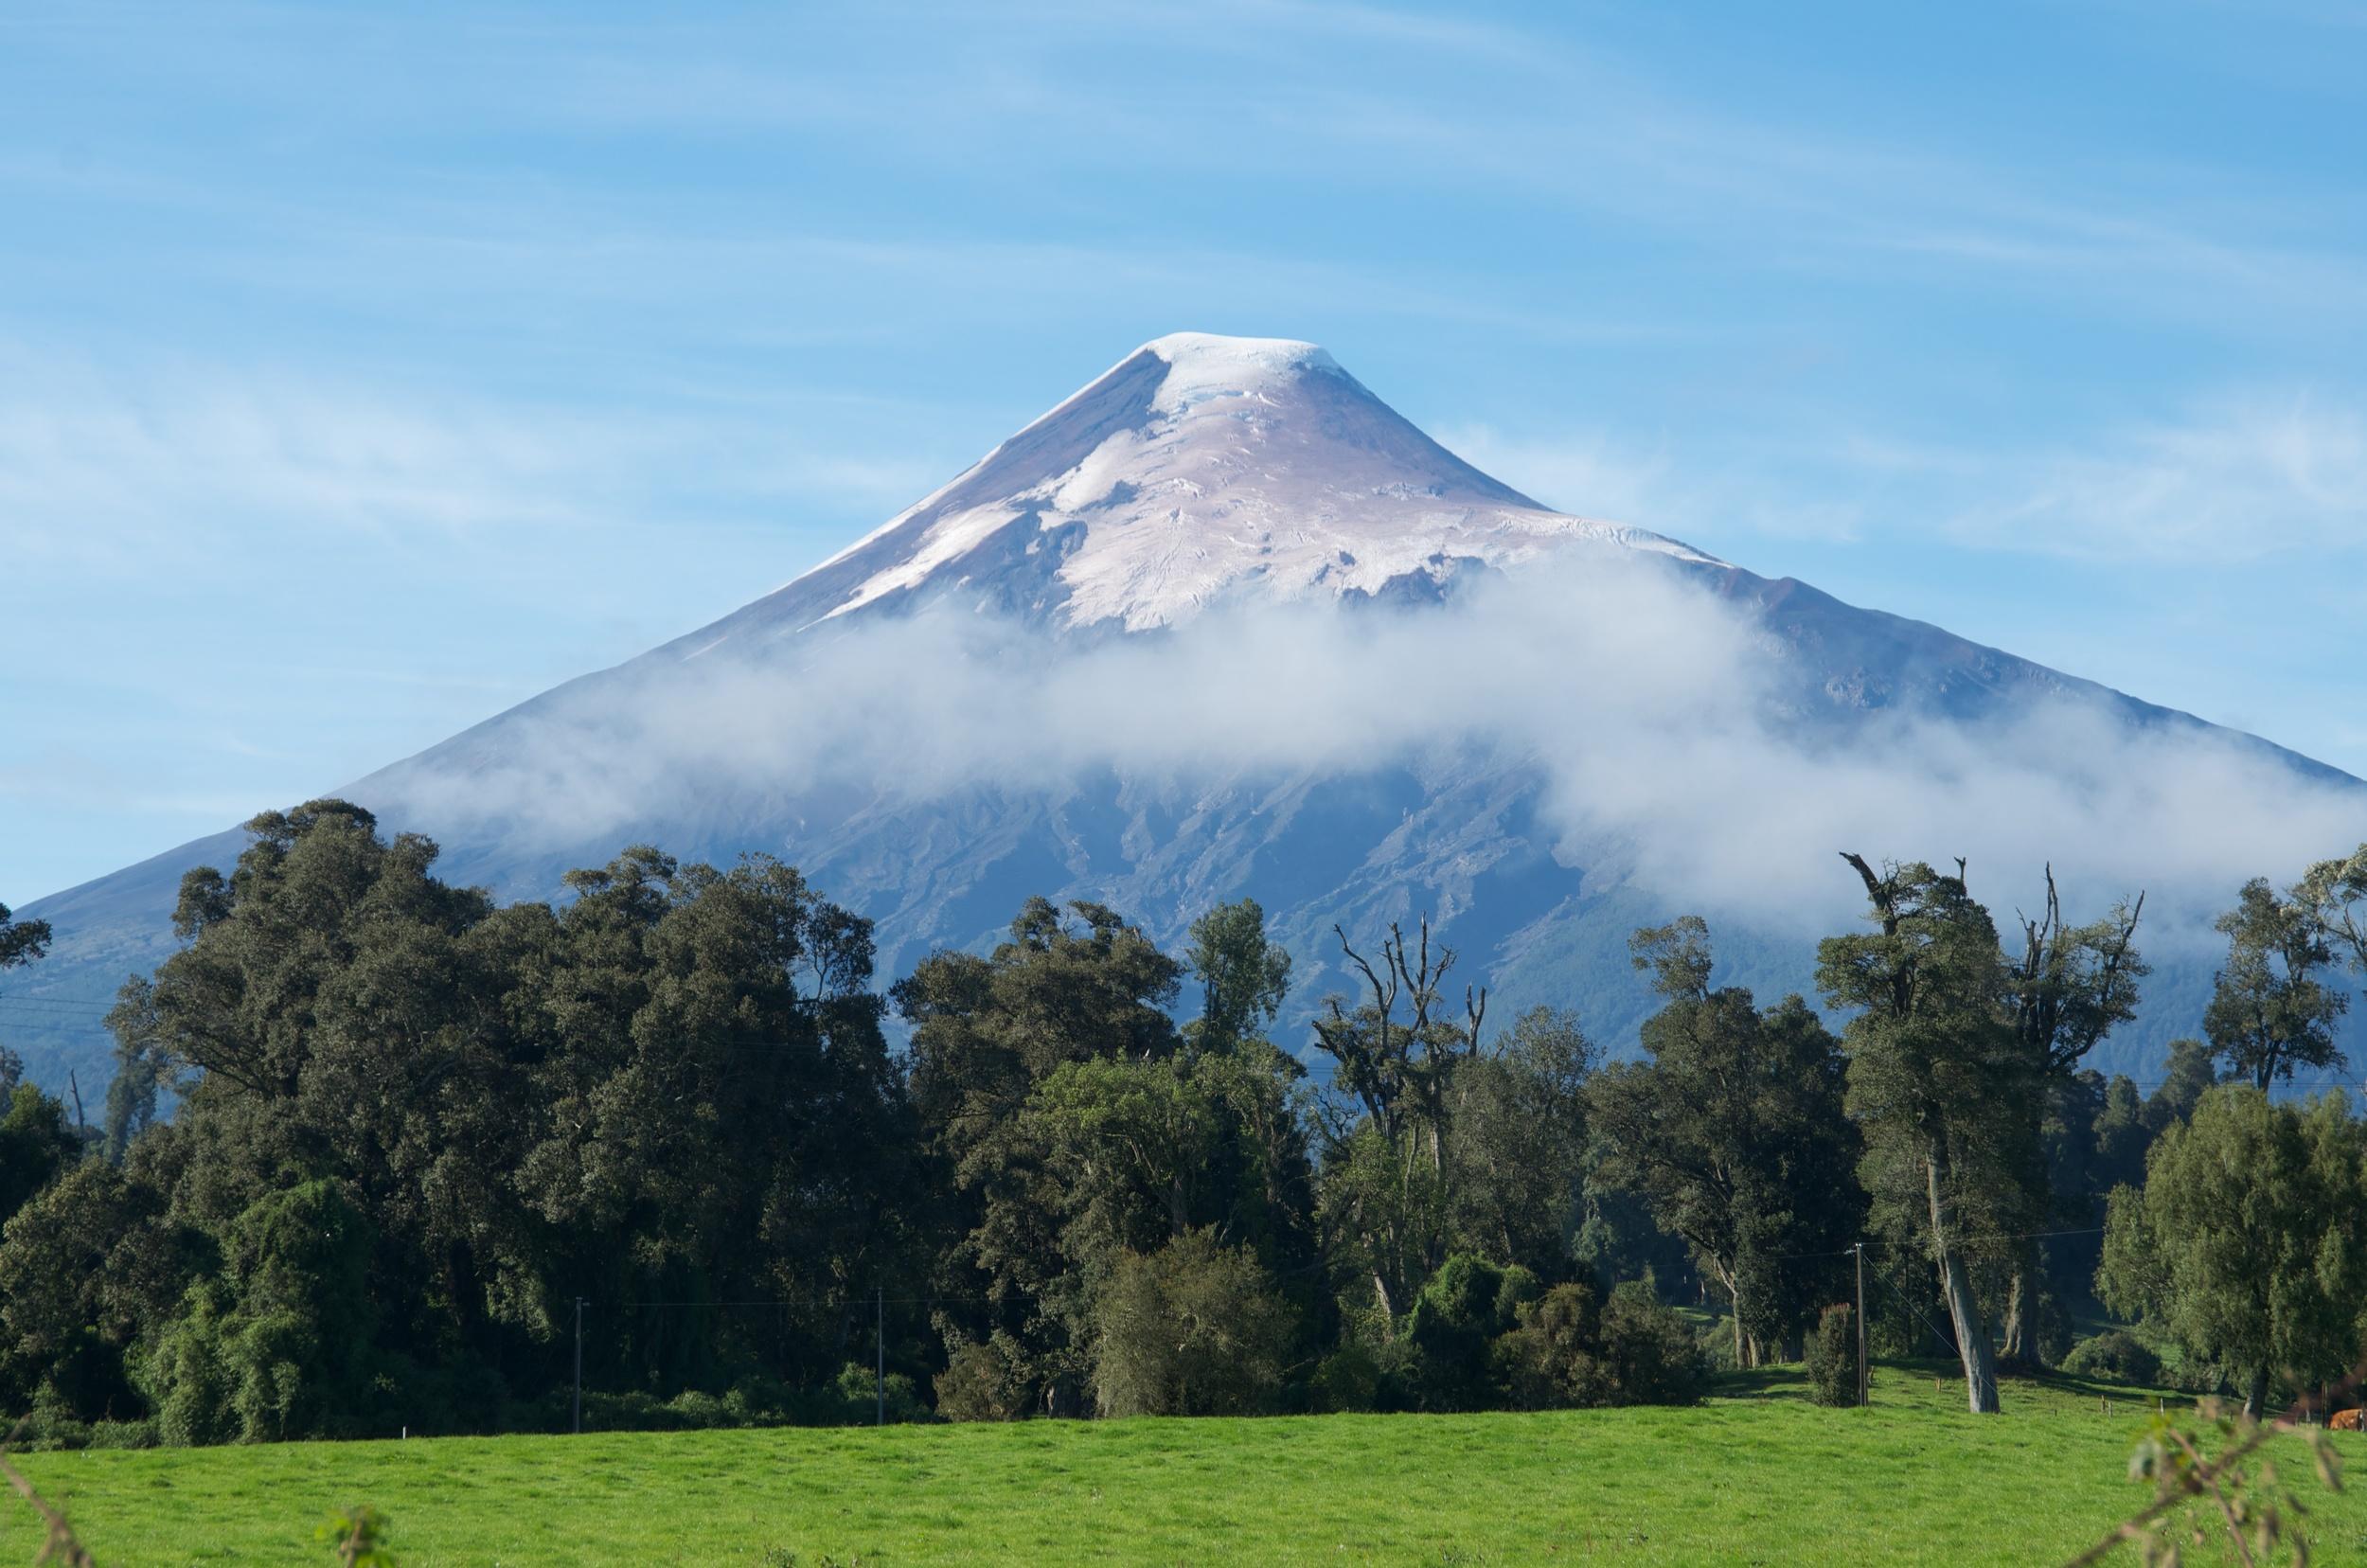 Osorno volcano from road, Lake District, Chile, 28 Mar 2012